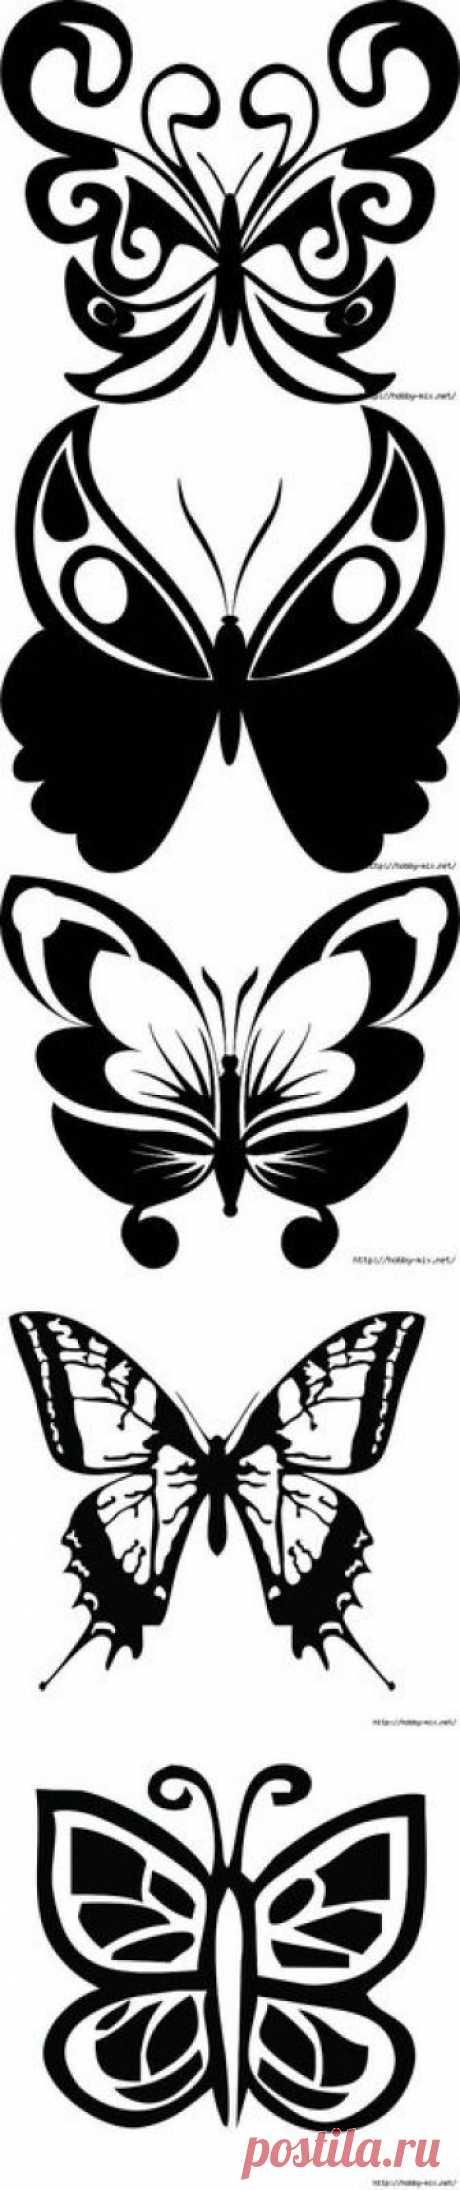 Красивые бабочки. Трафарет. | трафареты, шаблоны | Постила